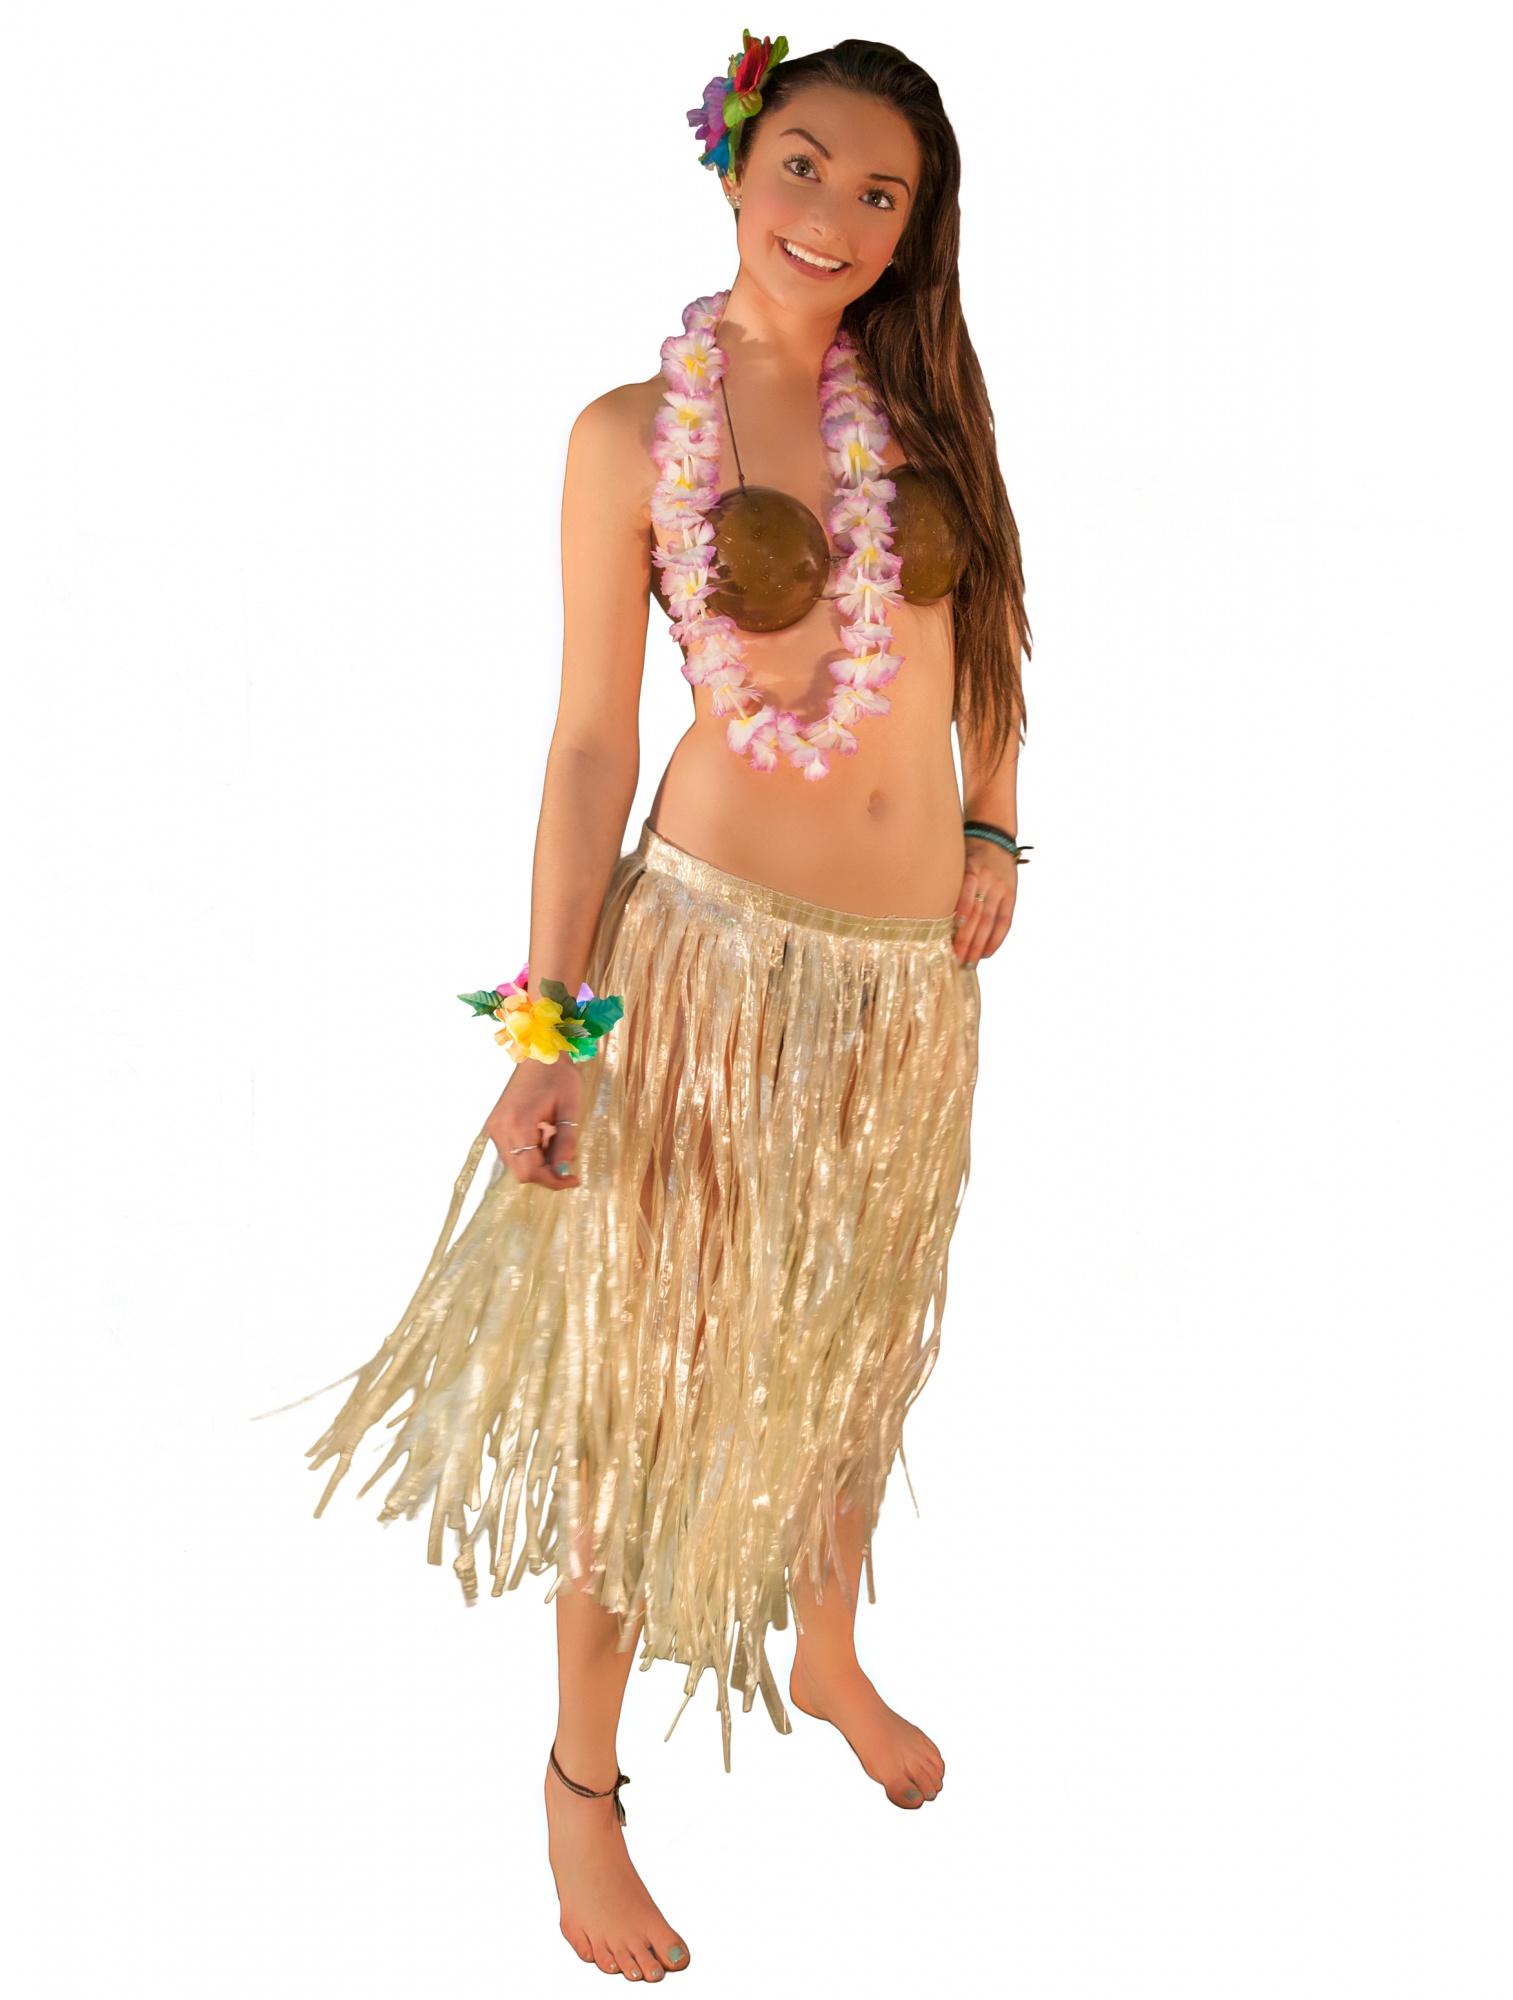 b0767117ee9 Hawaiian Luau Party Grass Skirt Coconut Bra Lei 5pc Hula Girl ...